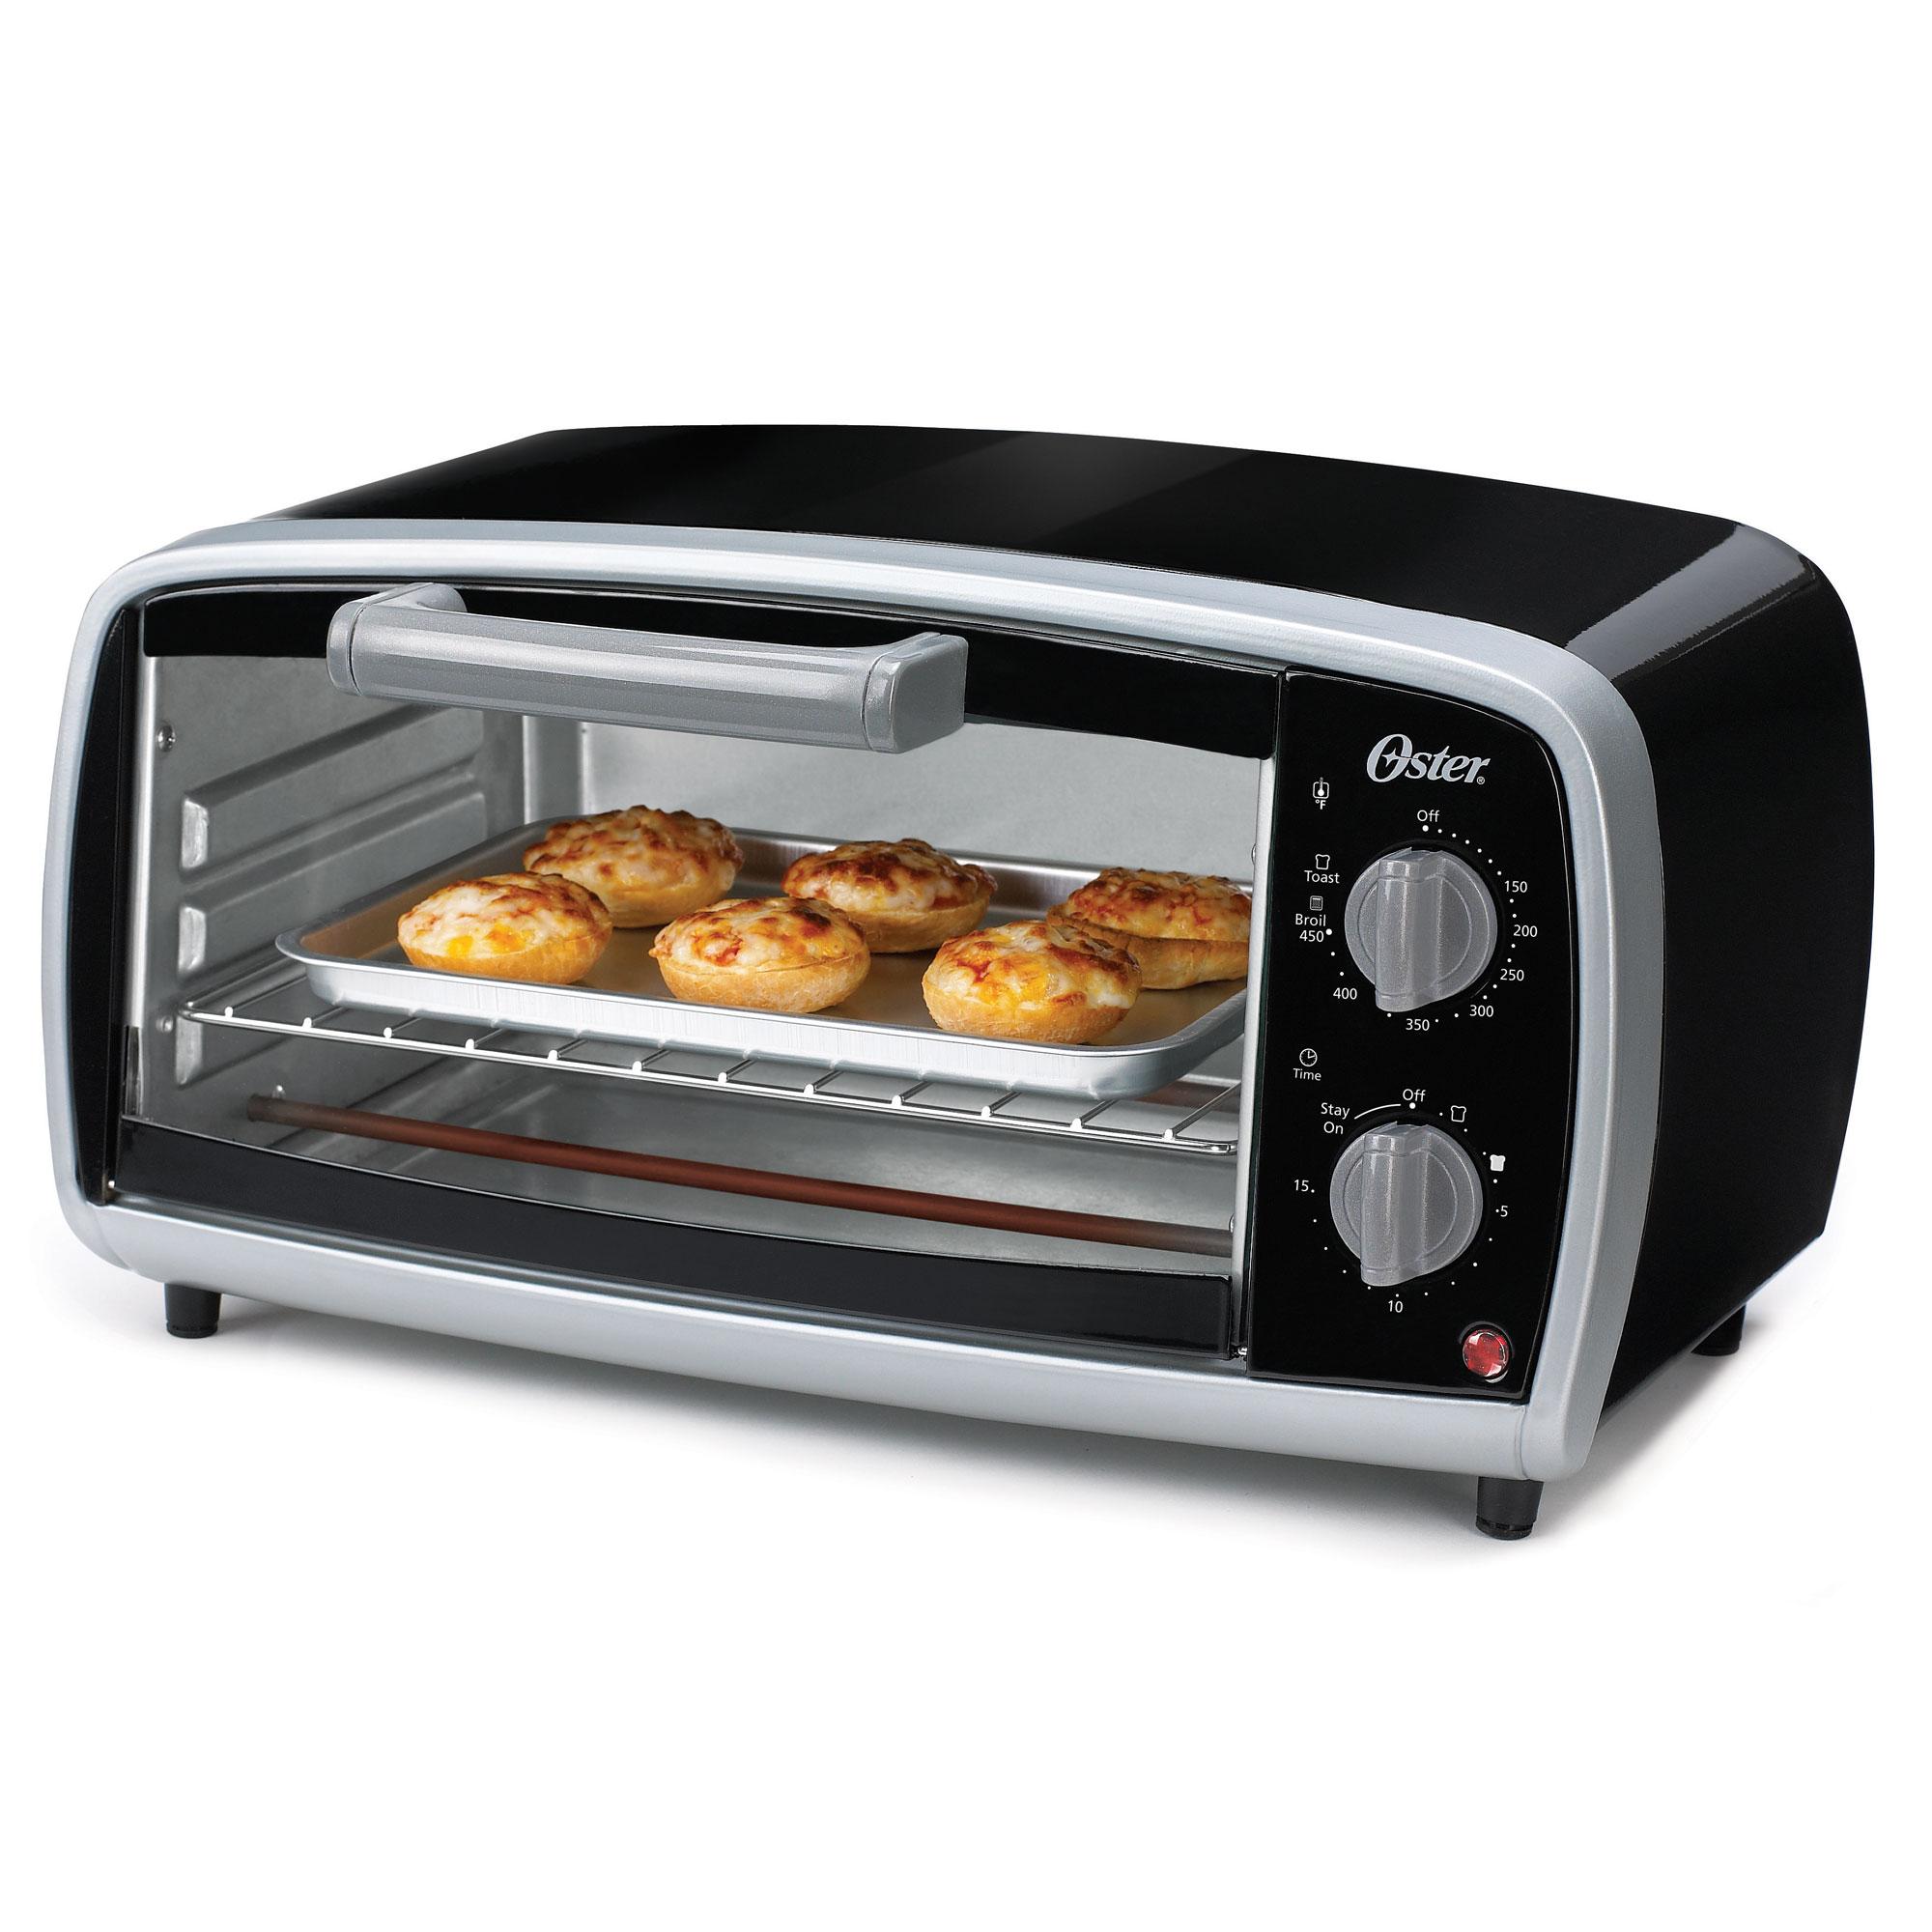 Sunbeam Coffee Maker Kmart : Sunbeam TSSTTVVG01 Oster 4 Slice Toaster Oven Black/Silver